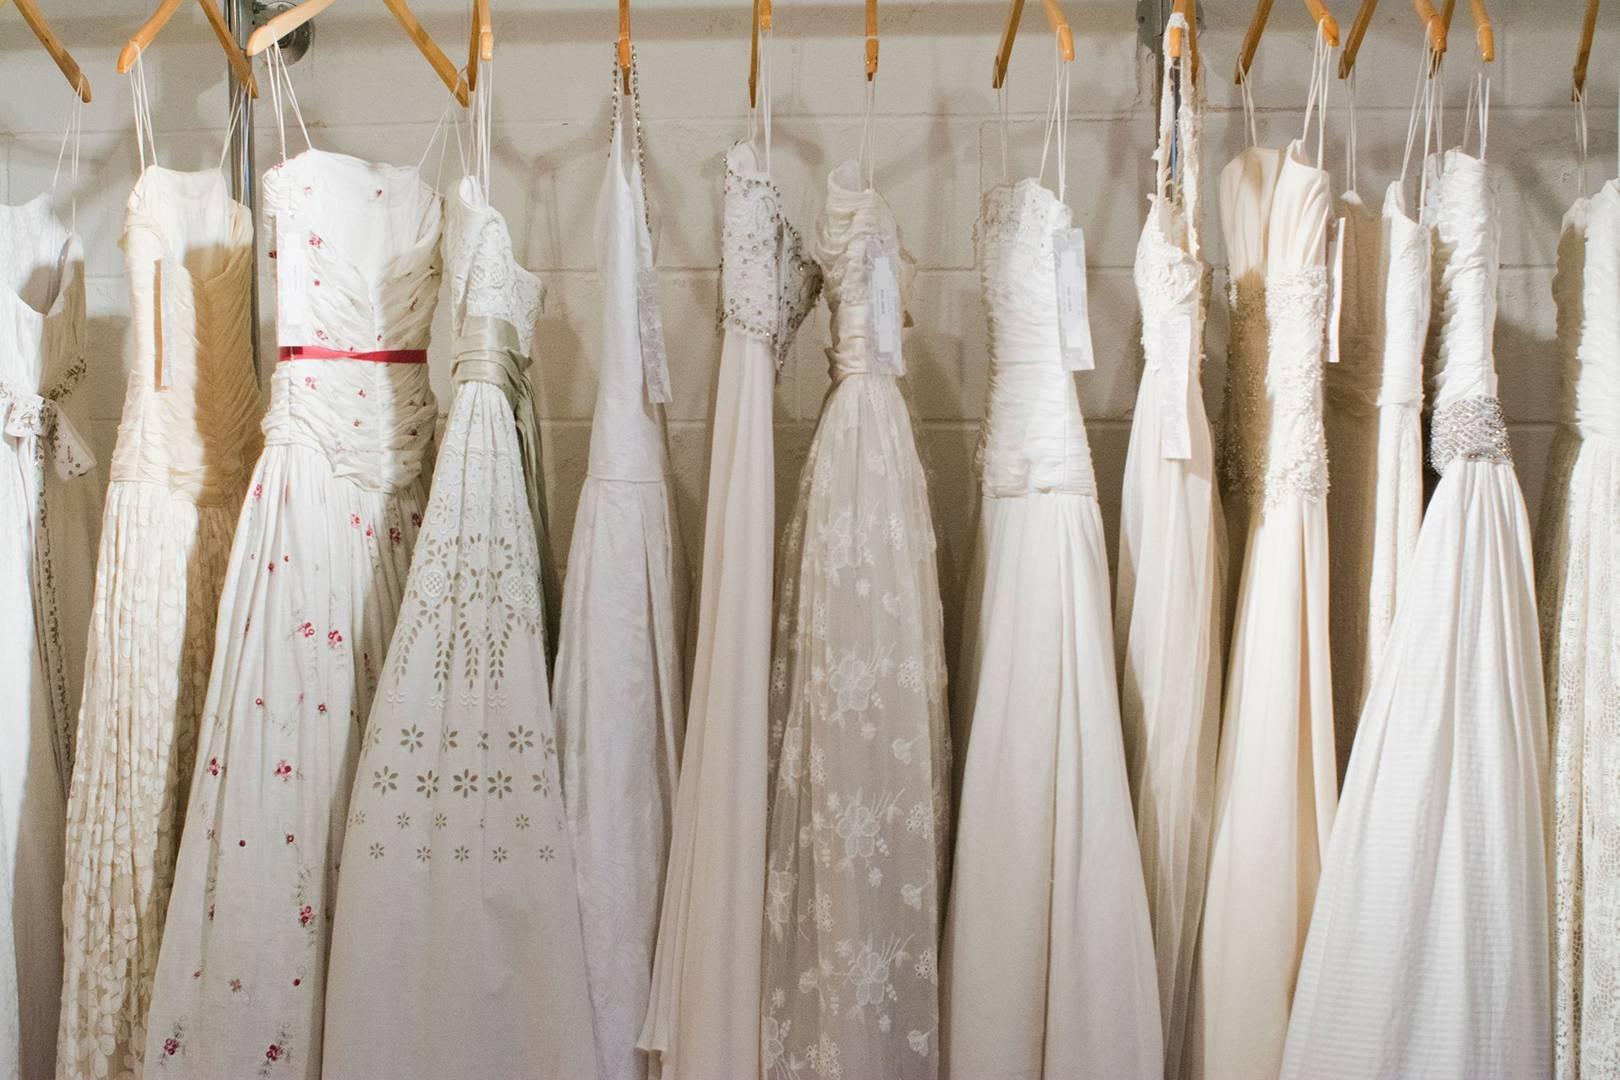 wedding-gowns-brides-1jun17-rex_b.jpg